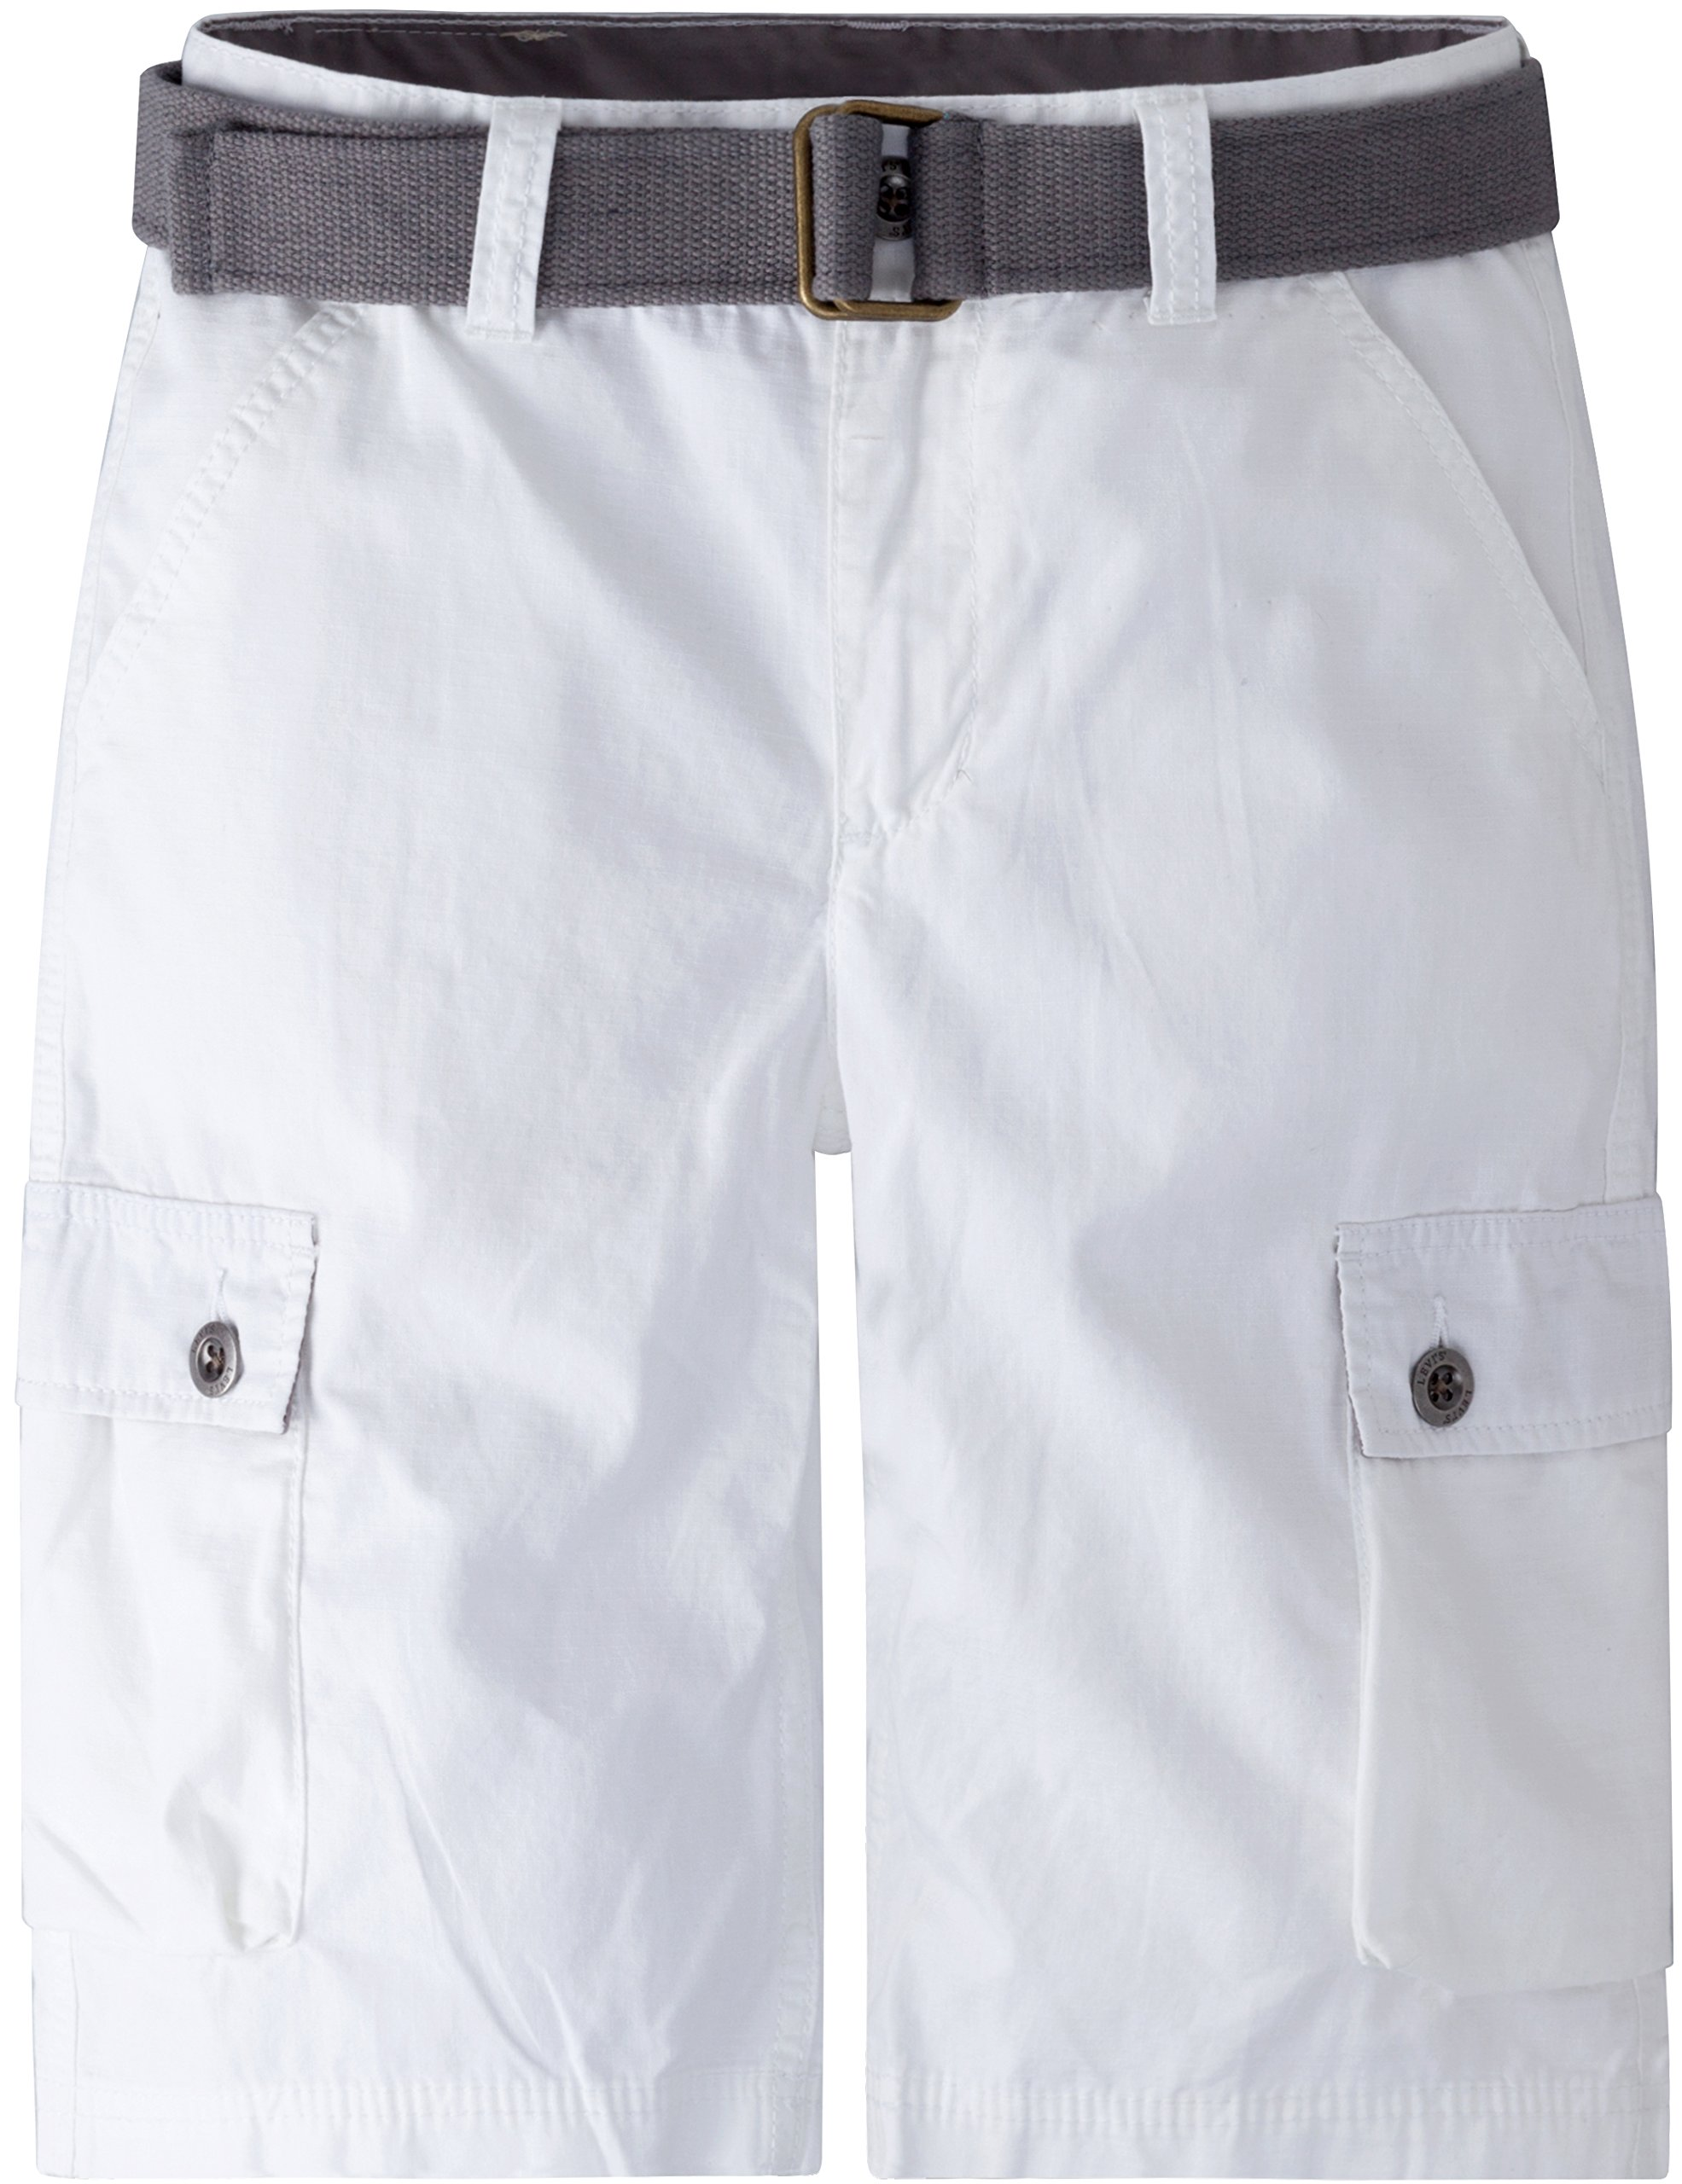 Levi's Boys' Big Cargo Shorts, White 12